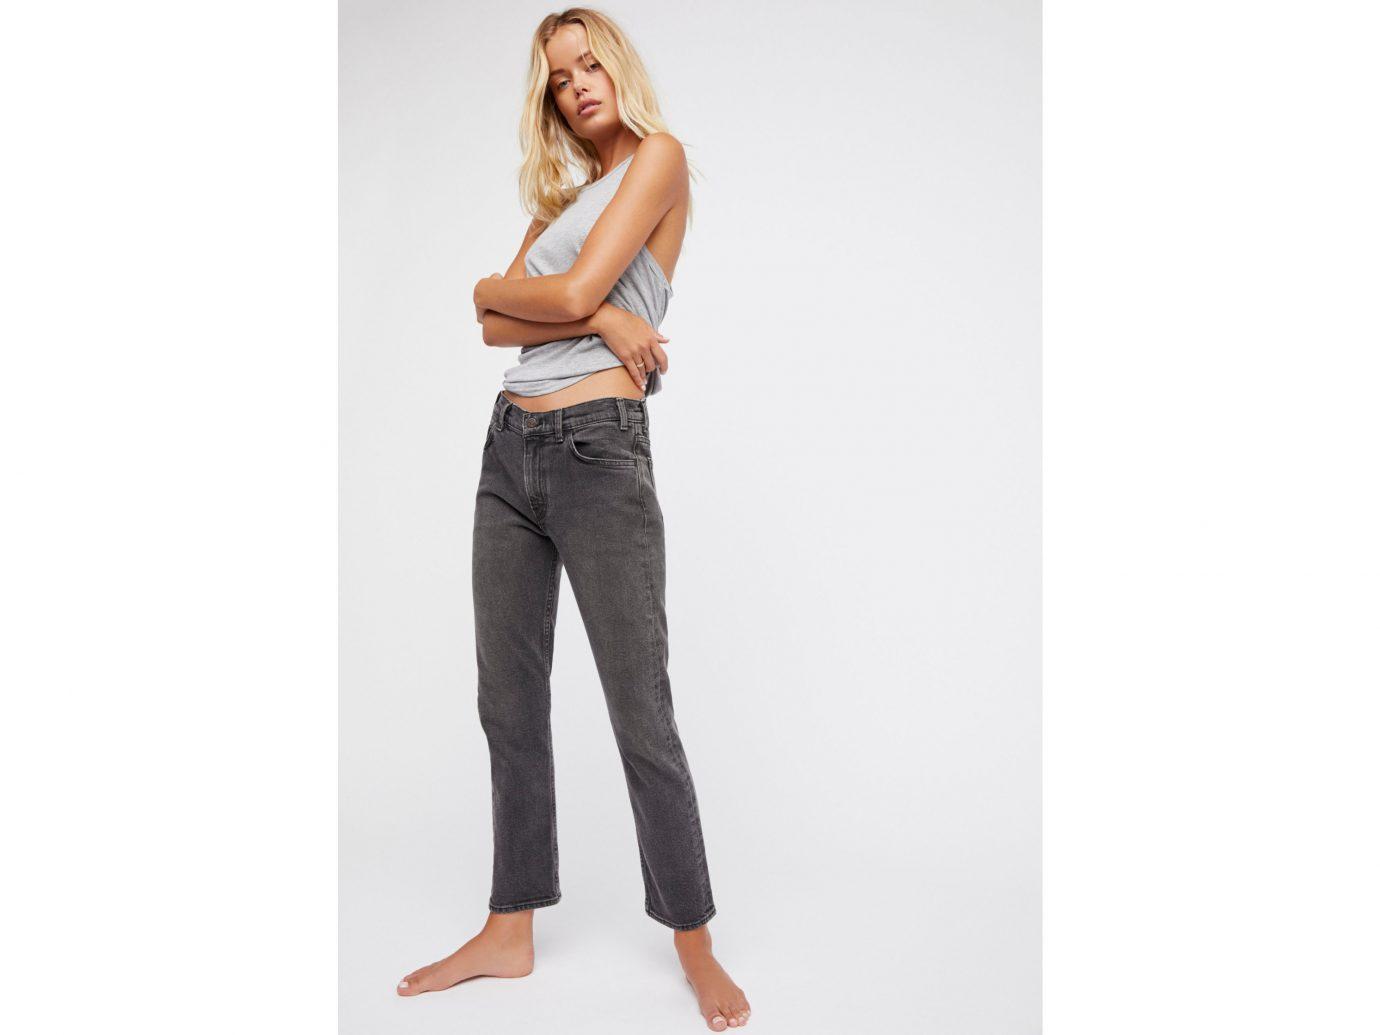 Style + Design clothing jeans person trouser shoulder denim standing waist fashion model posing trousers joint abdomen neck